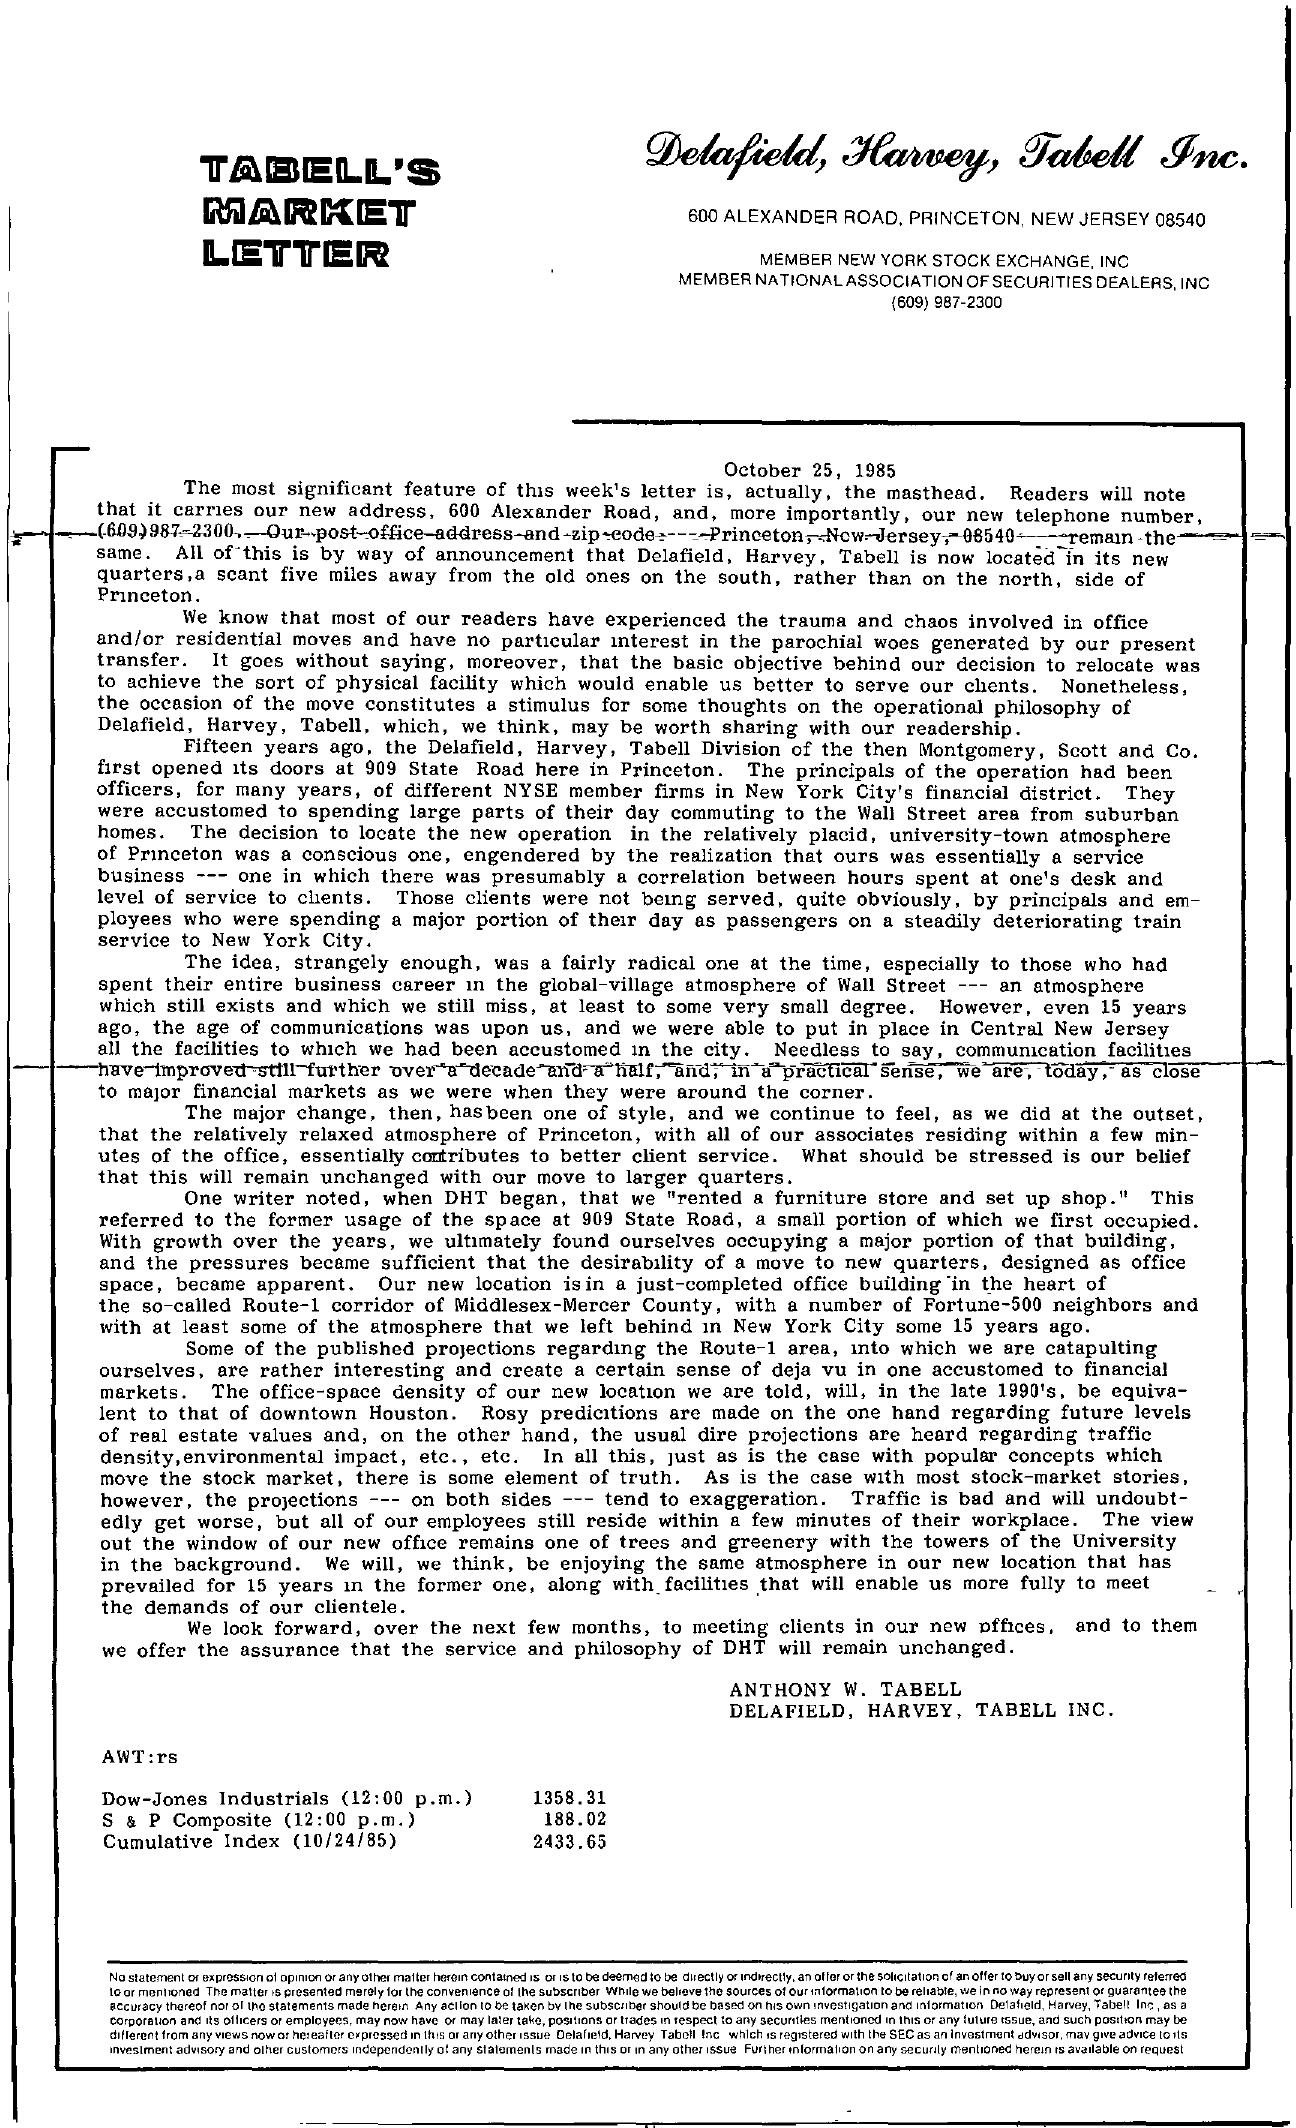 Tabell's Market Letter - October 25, 1985